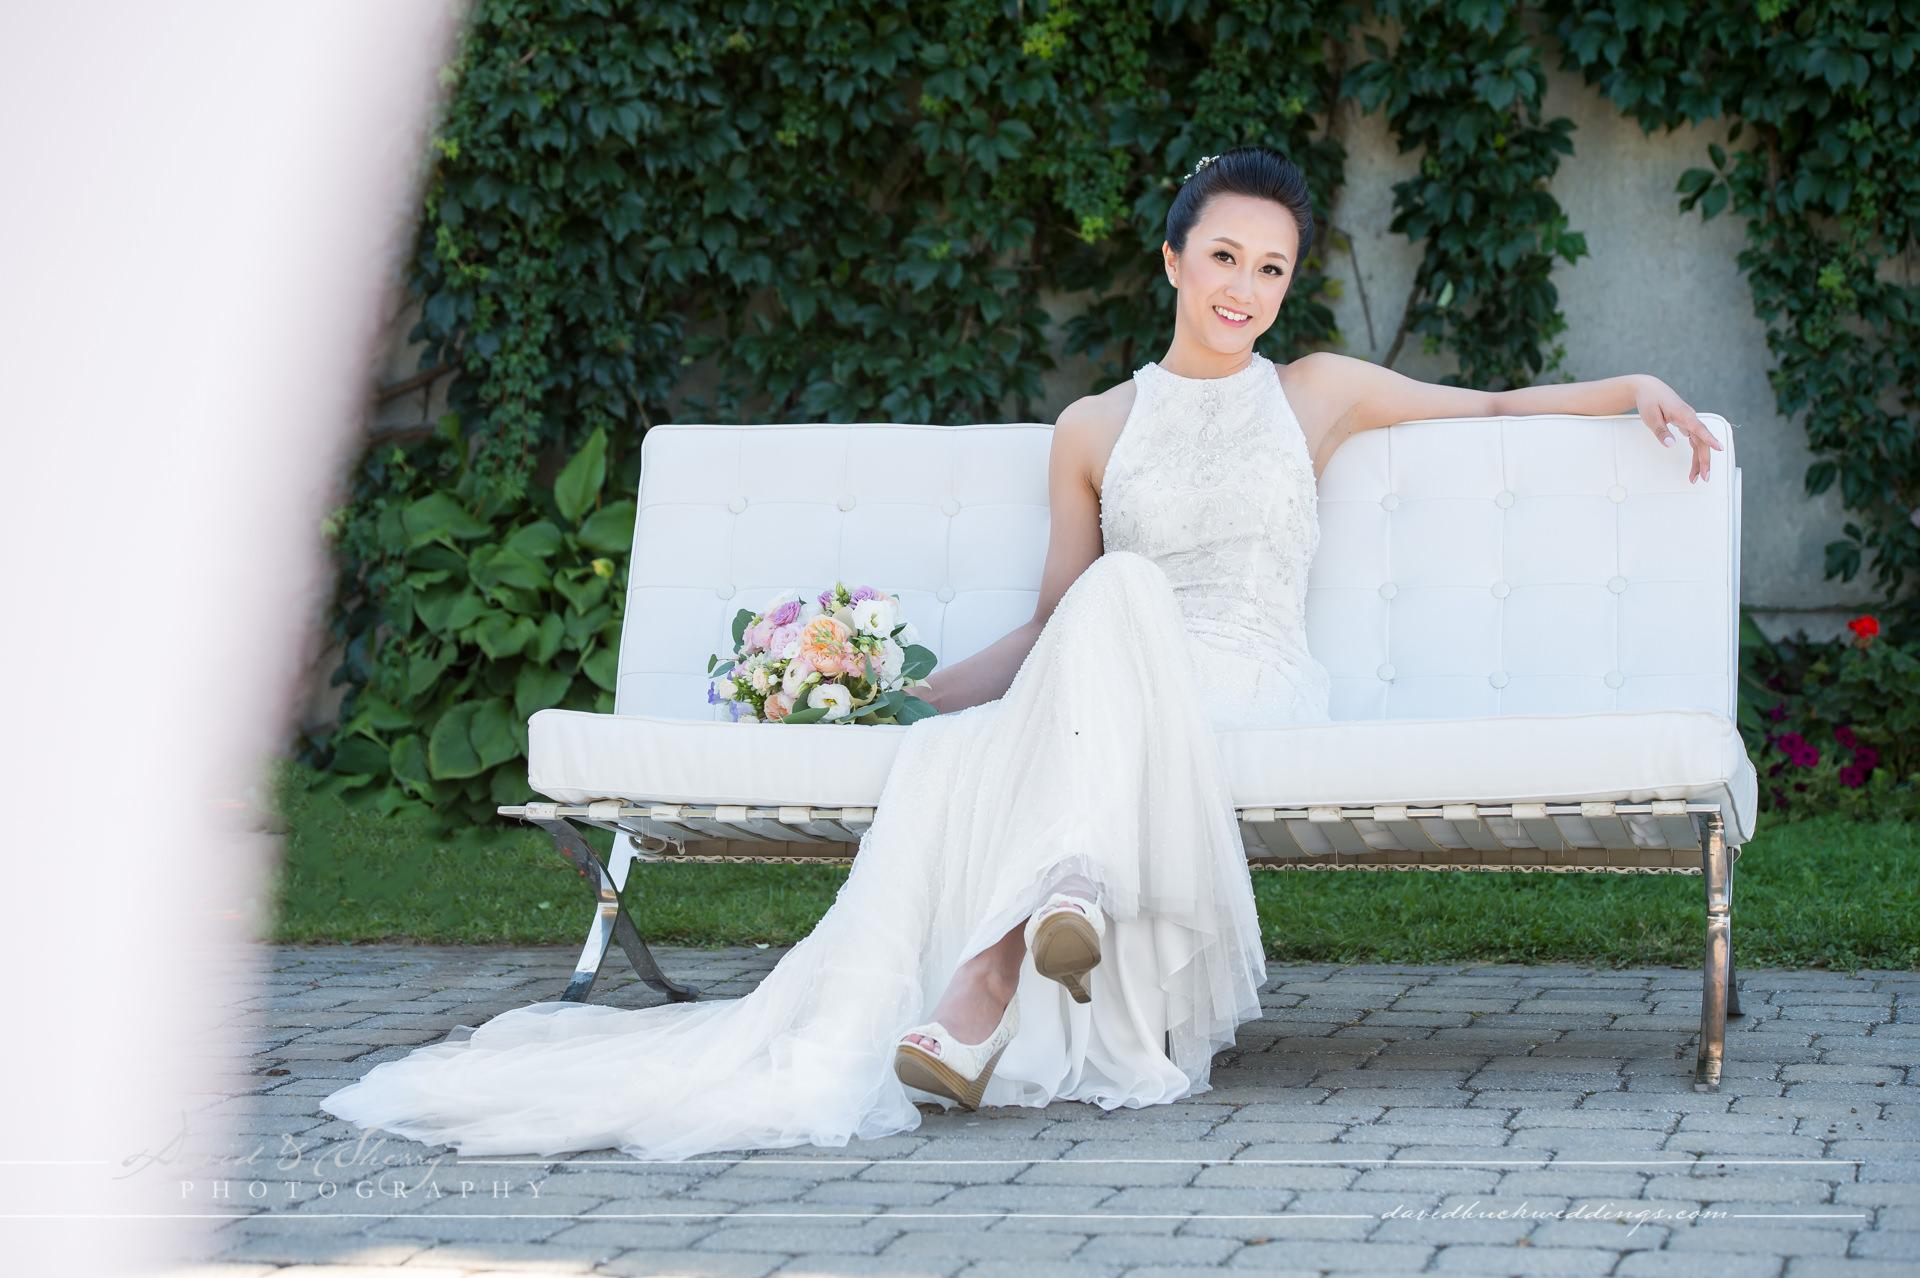 waterstone-estate-wedding-david-sherry-photography-simon-crystal-007